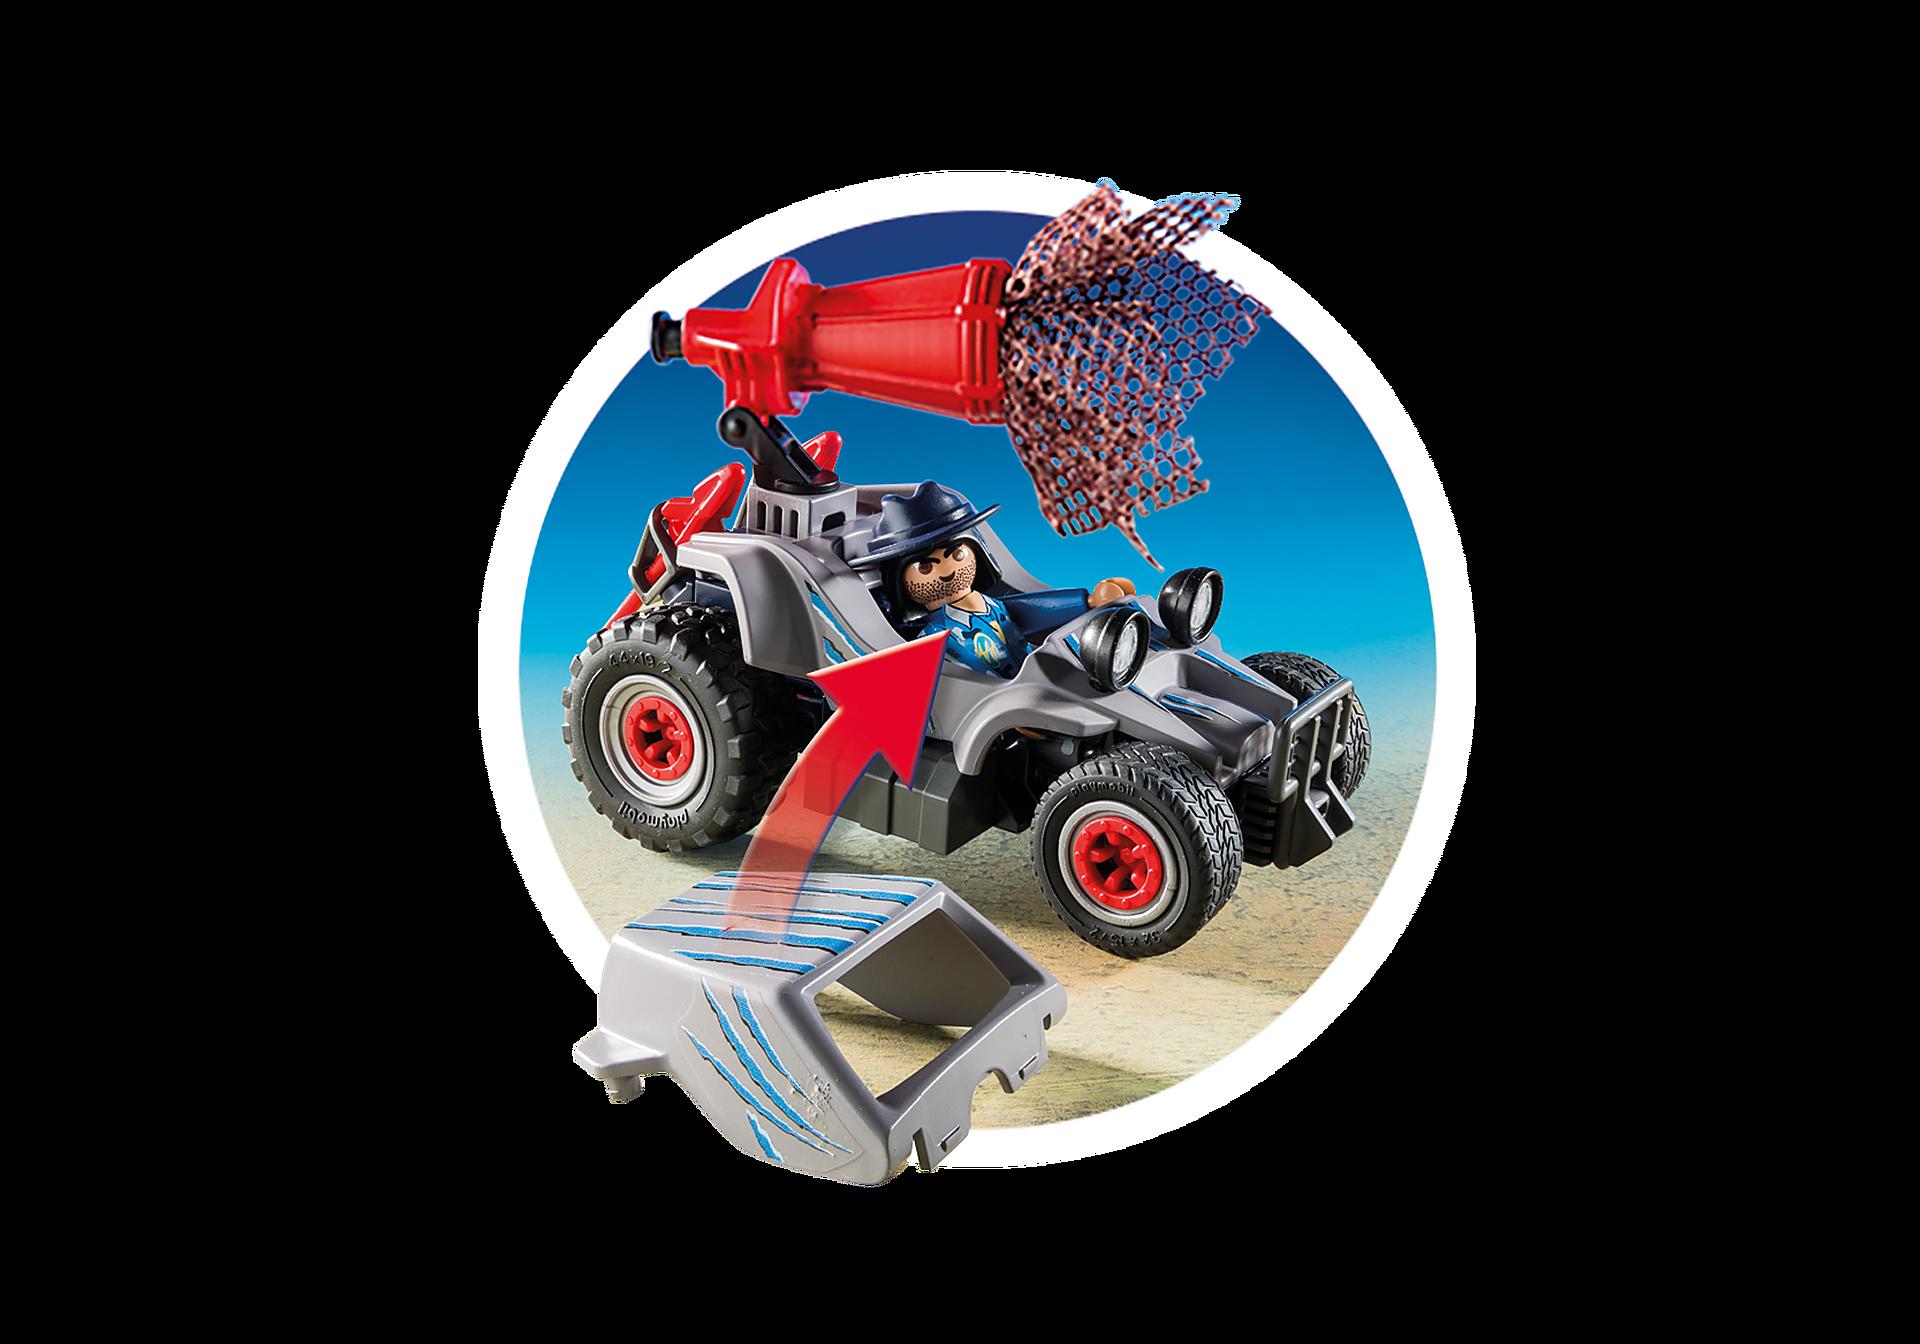 http://media.playmobil.com/i/playmobil/9434_product_extra3/Όχημα λαθροκυνηγών και οικογένεια Τρικεράτωψ